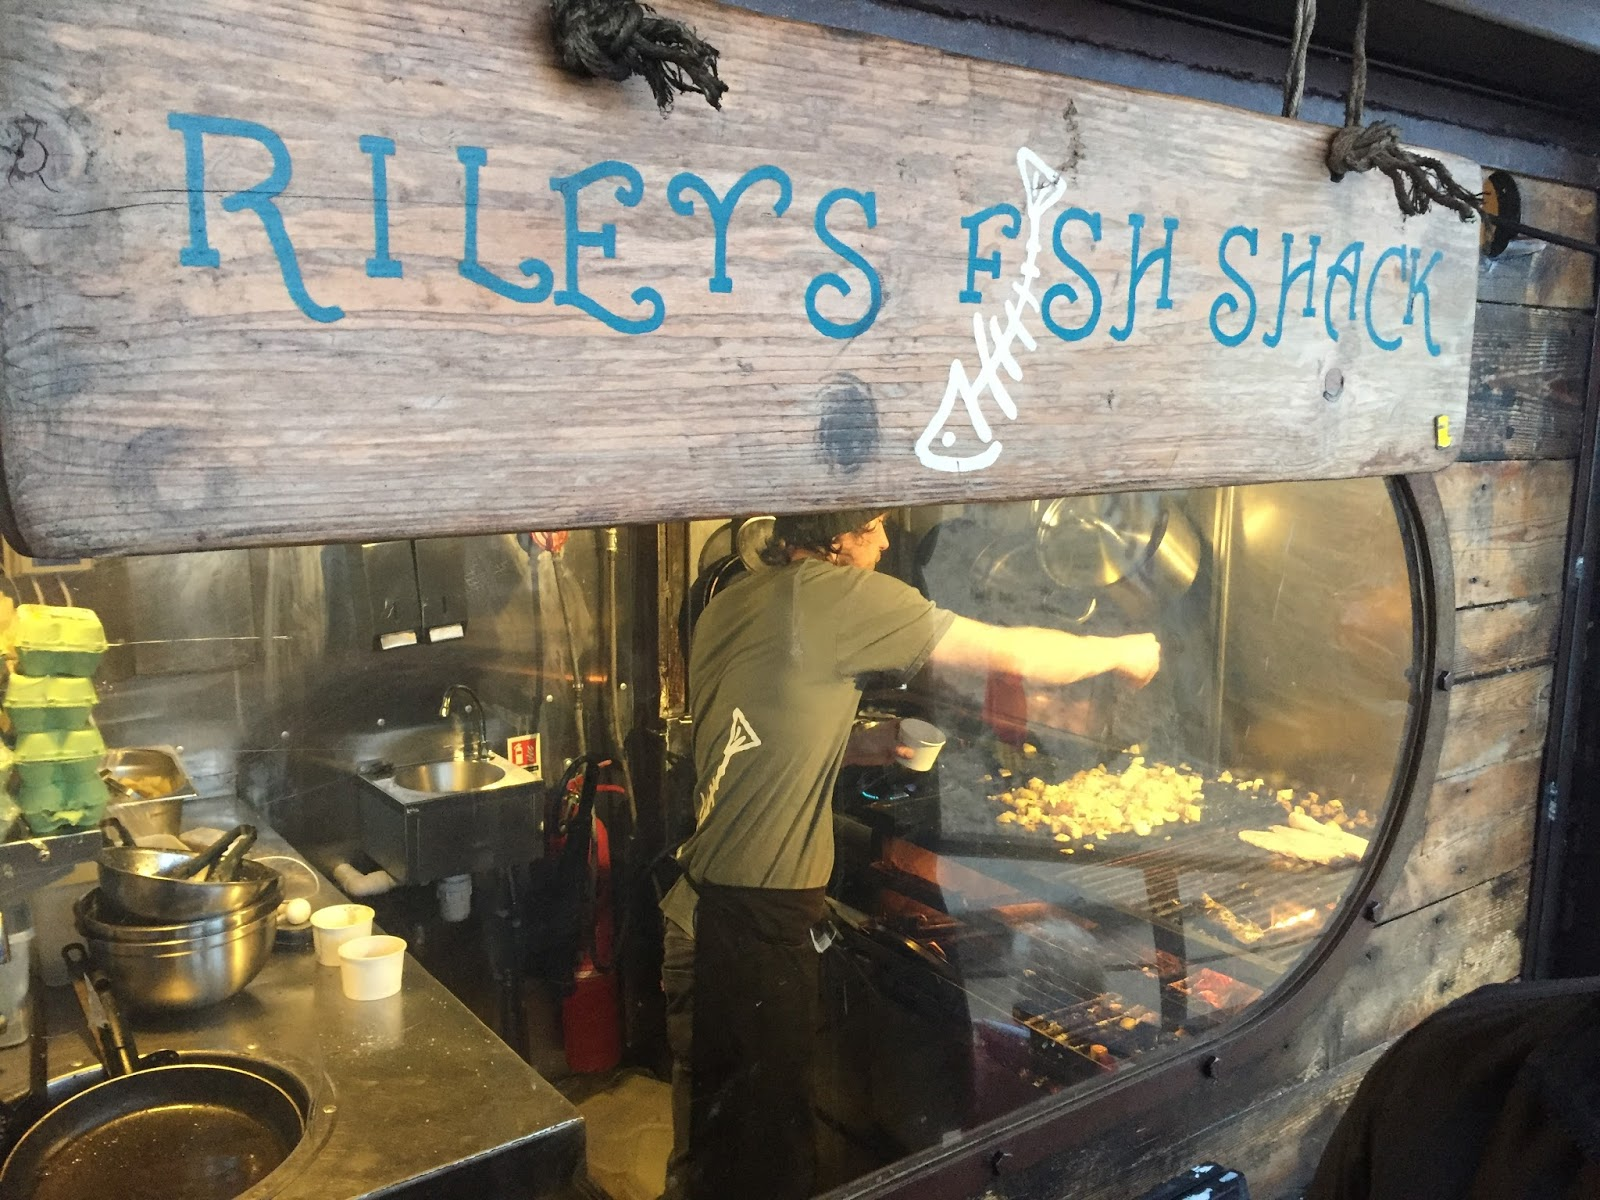 Weekend in Tynemouth, Newcastle, Rileys fish shack